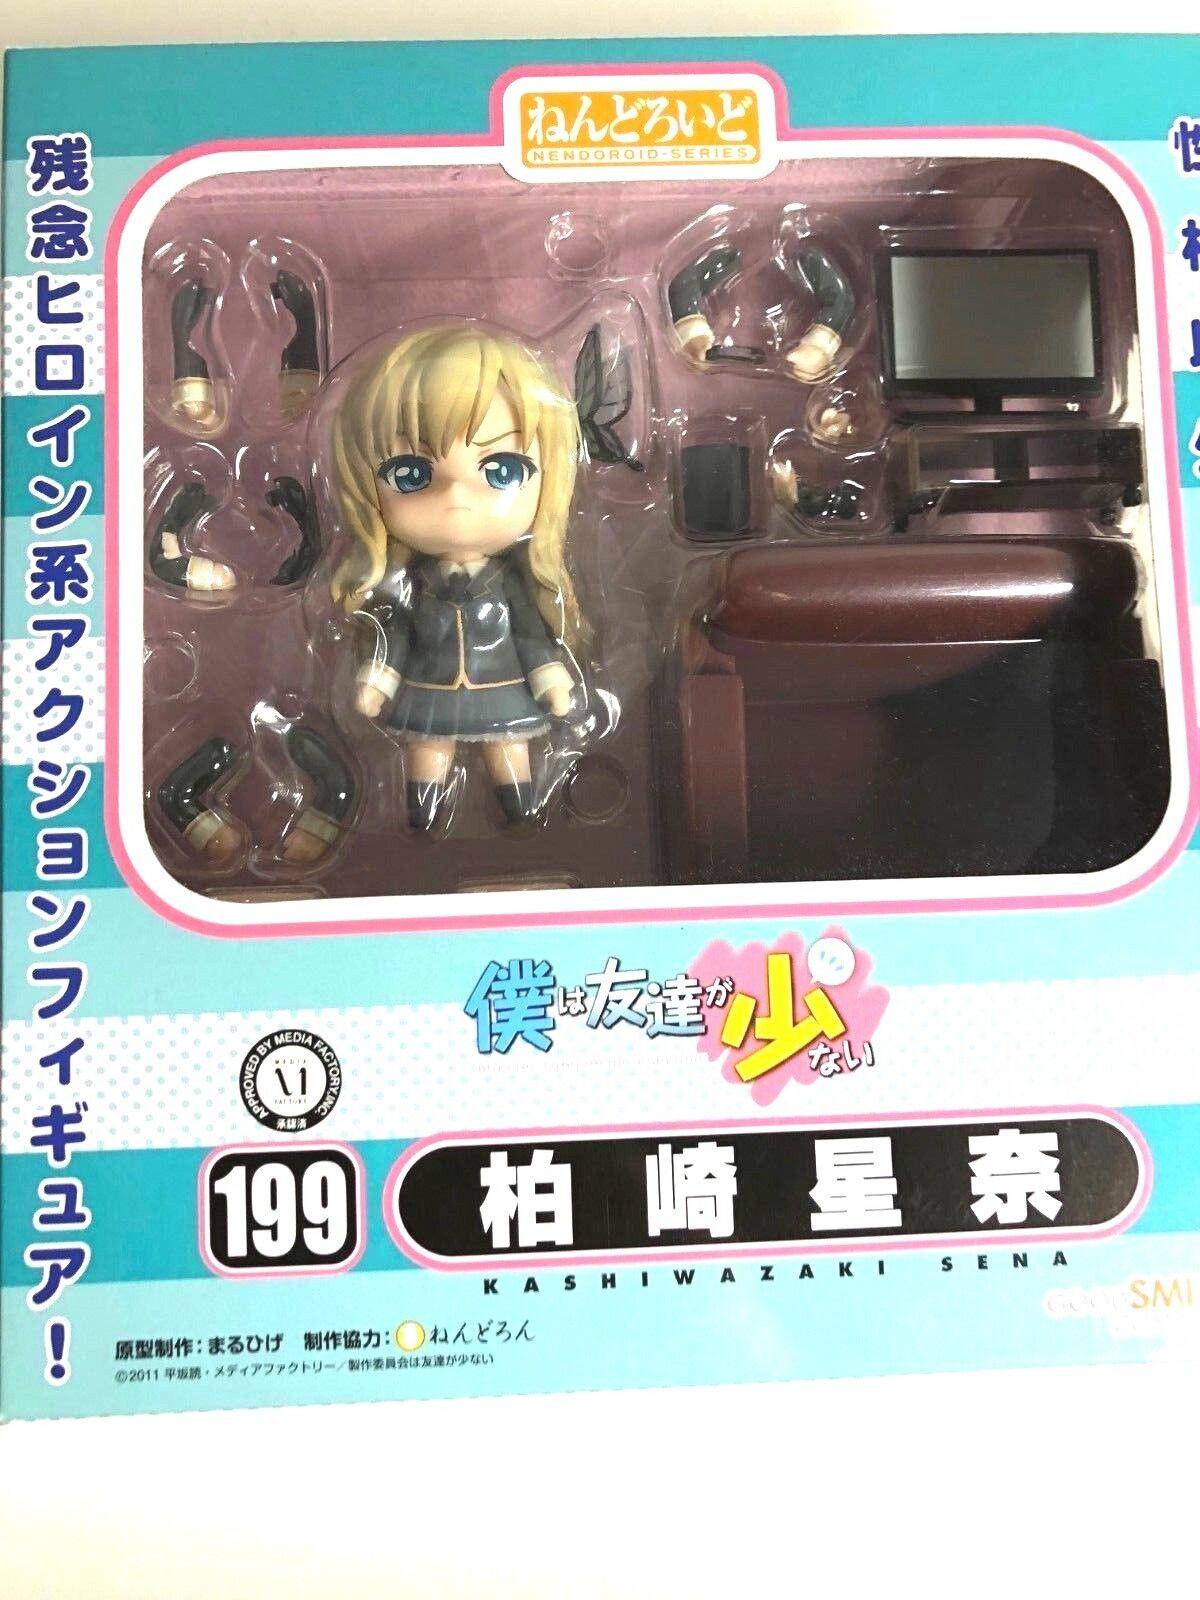 gratuito Shipping from Japan Authentic Nendoroid Sena Kashiwazaki Good Smile azienda